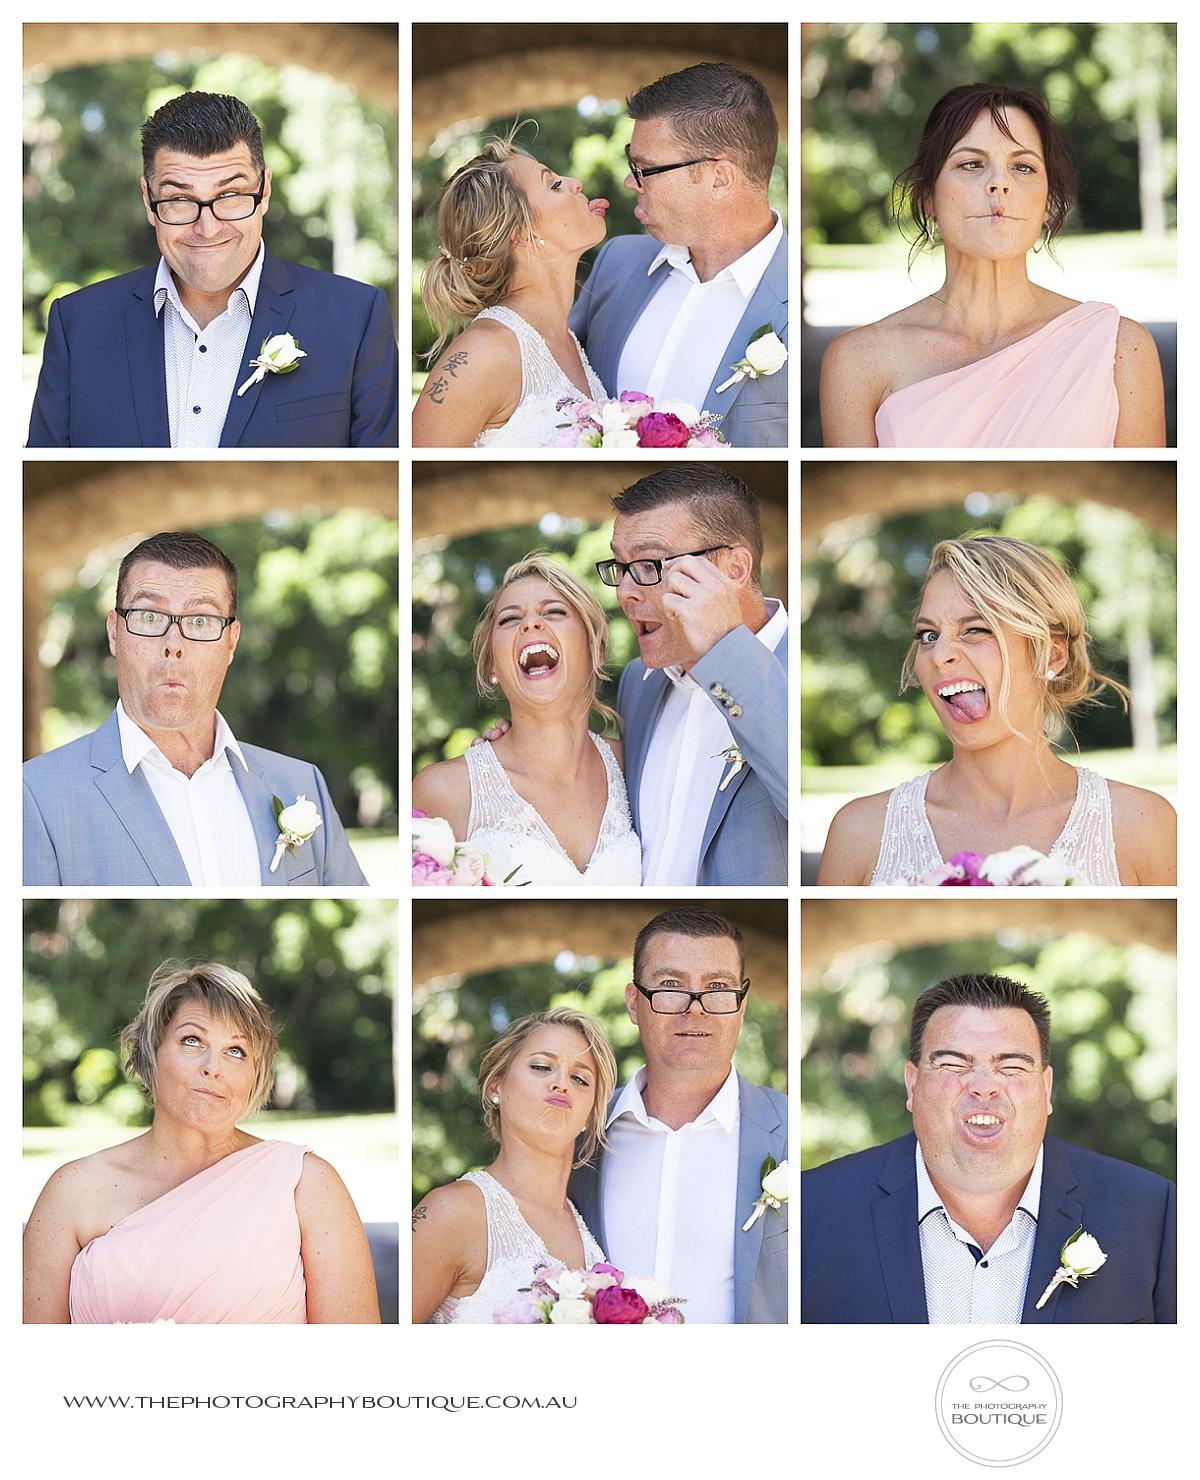 Perth UWA Wedding Photography_0004.jpg